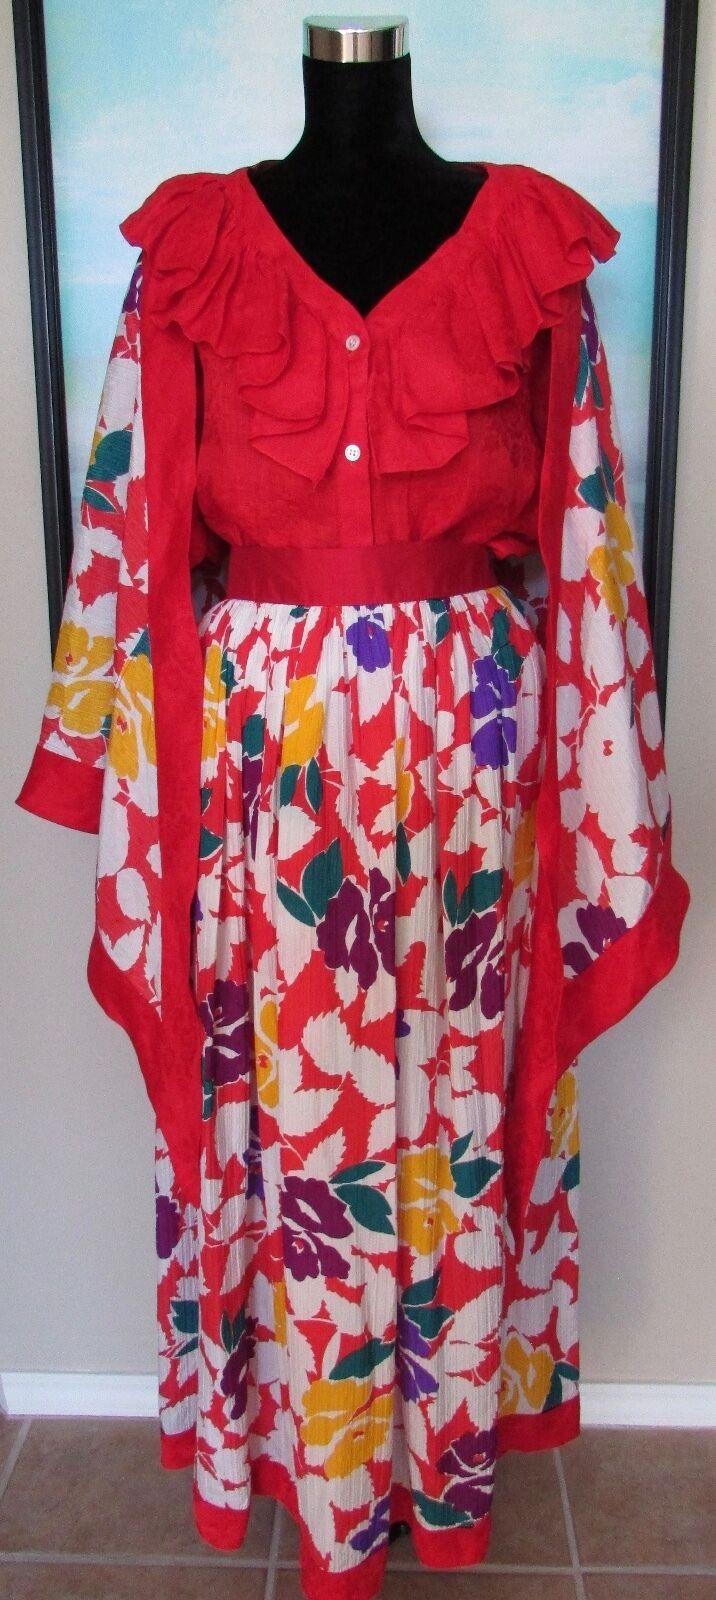 VTG Oscar de la Renta Couture Red Linen & Silk  Top & Skirt Sz 12 14